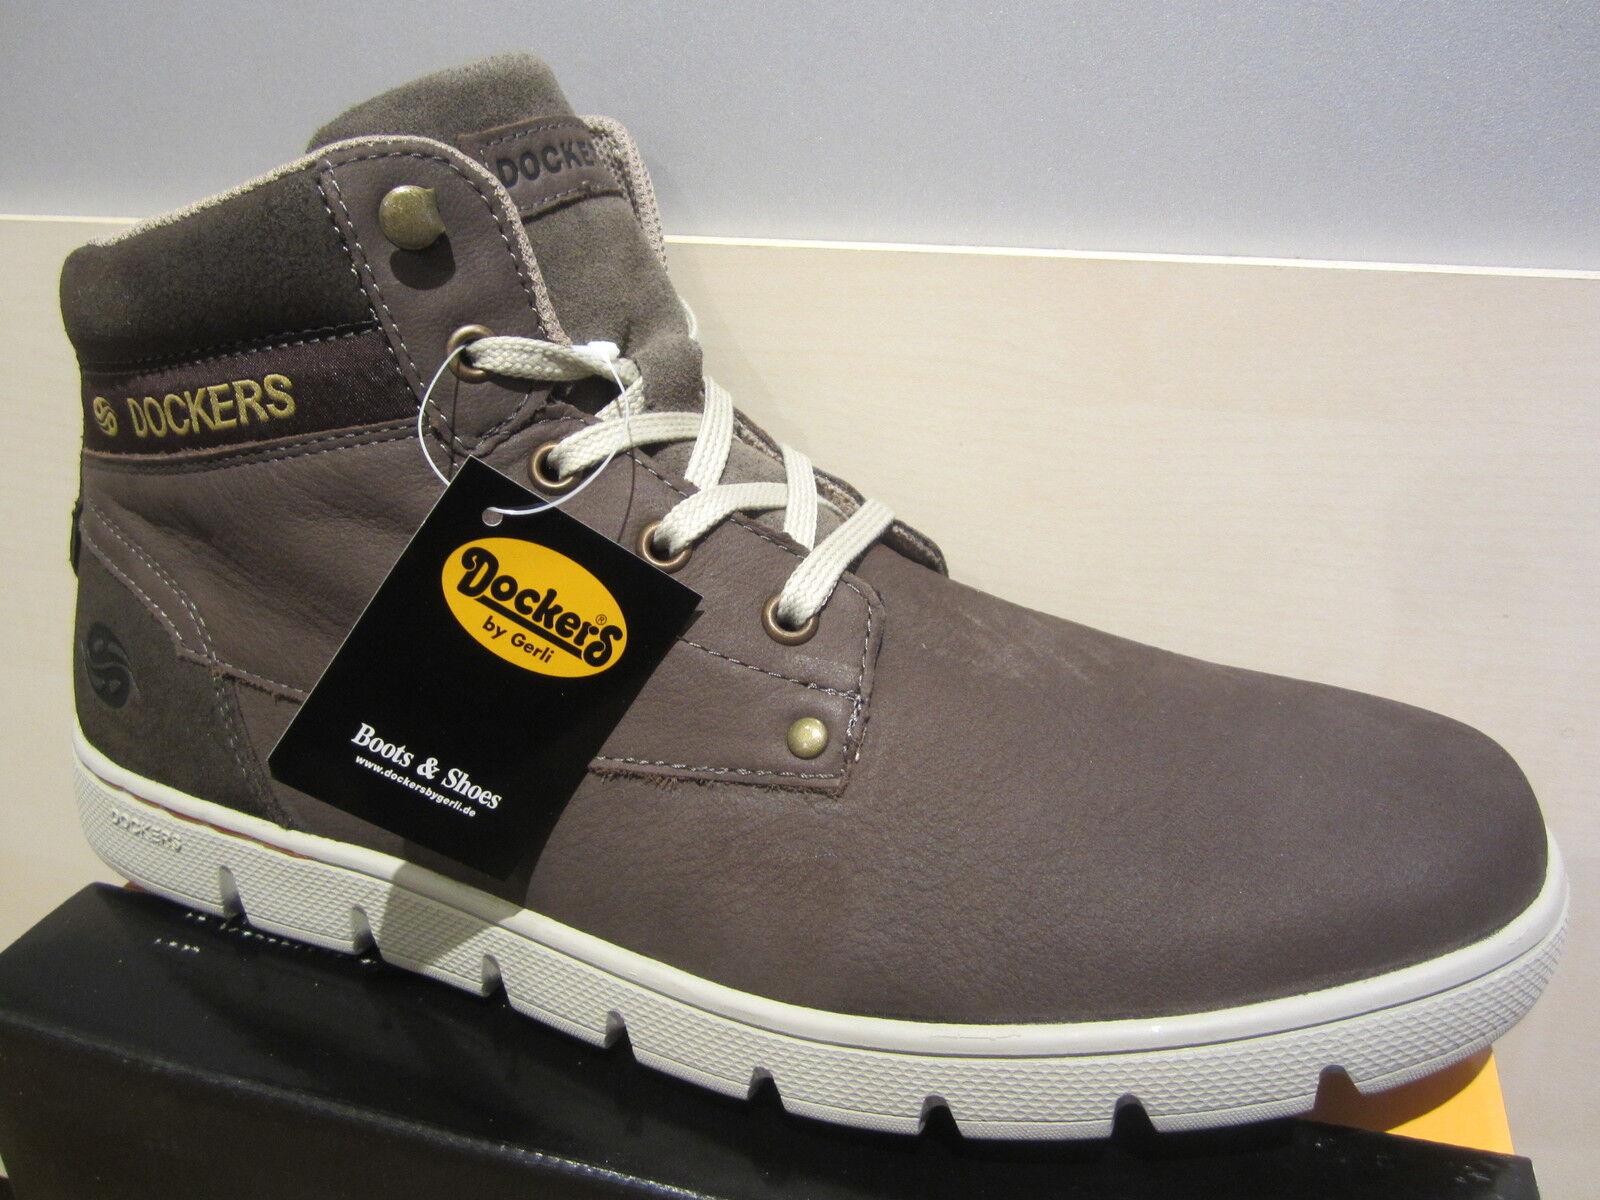 Dockers Stiefel Schnürstiefel Boots, grau, Echtleder, Stofffutter, 352622  NEU